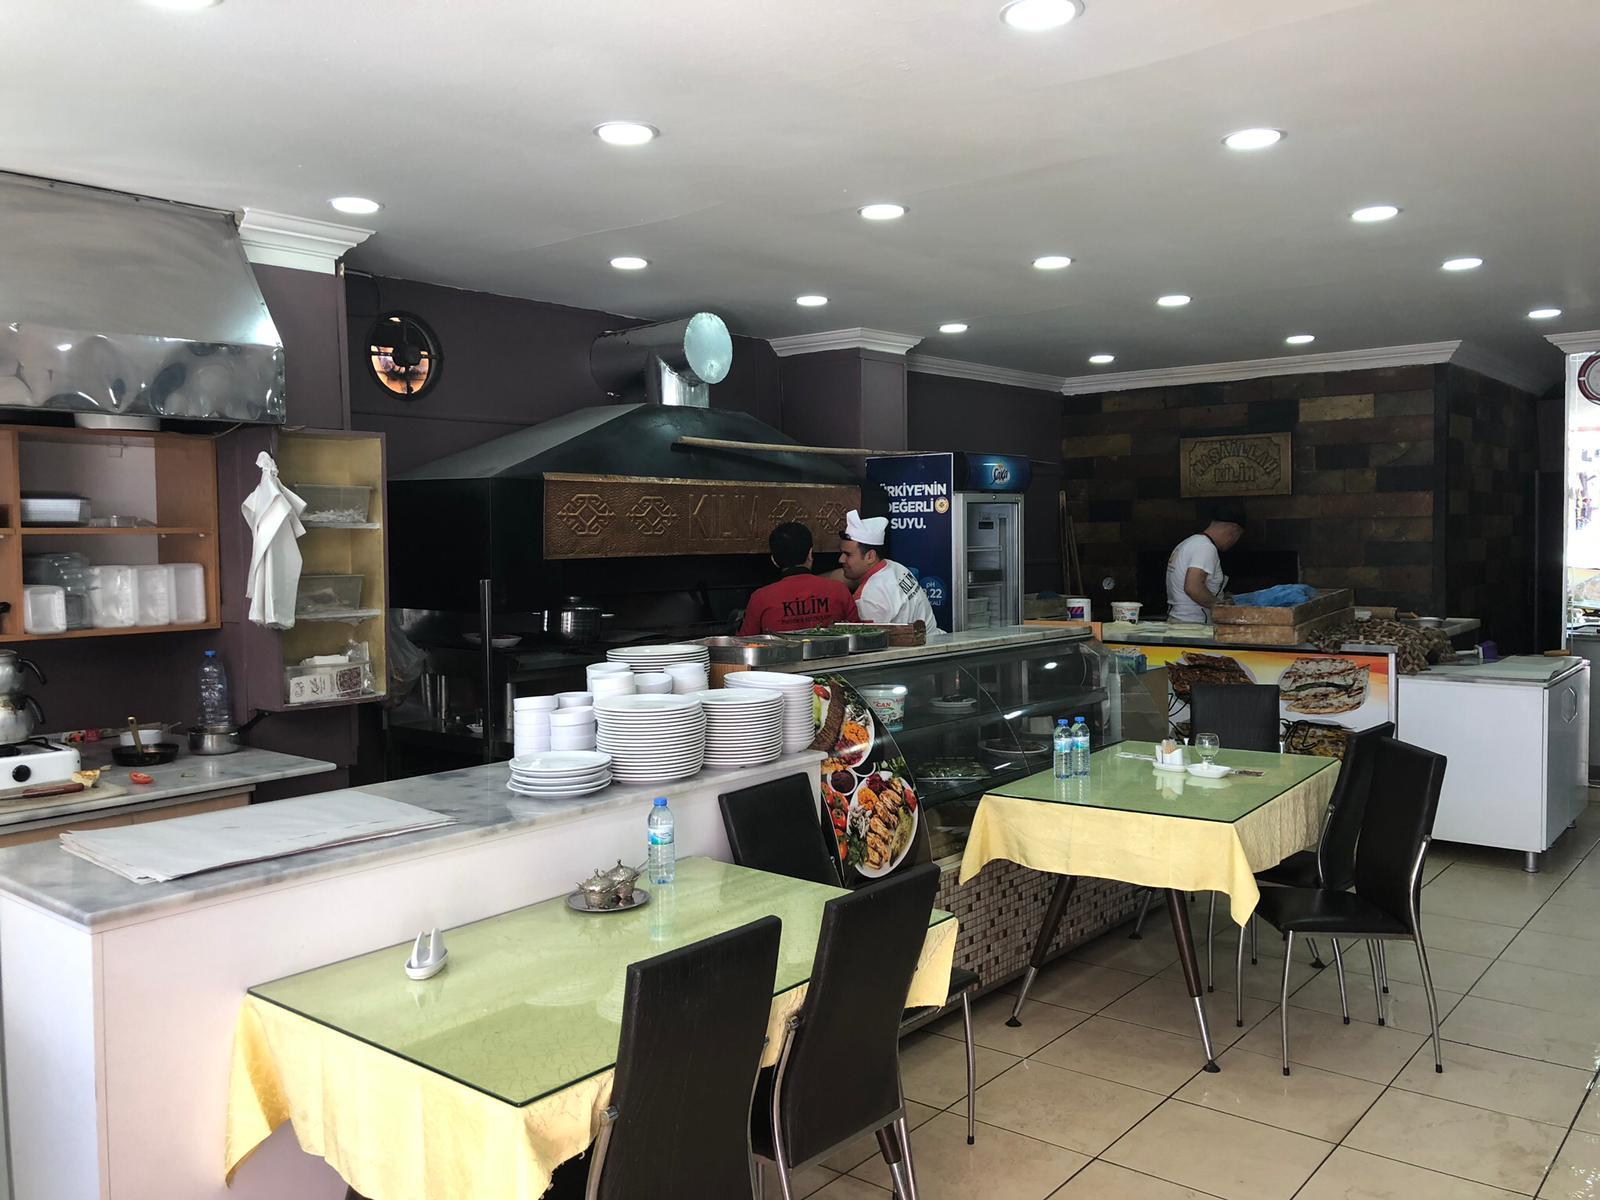 Kilim Unlu Mamülleri ve Restaurant